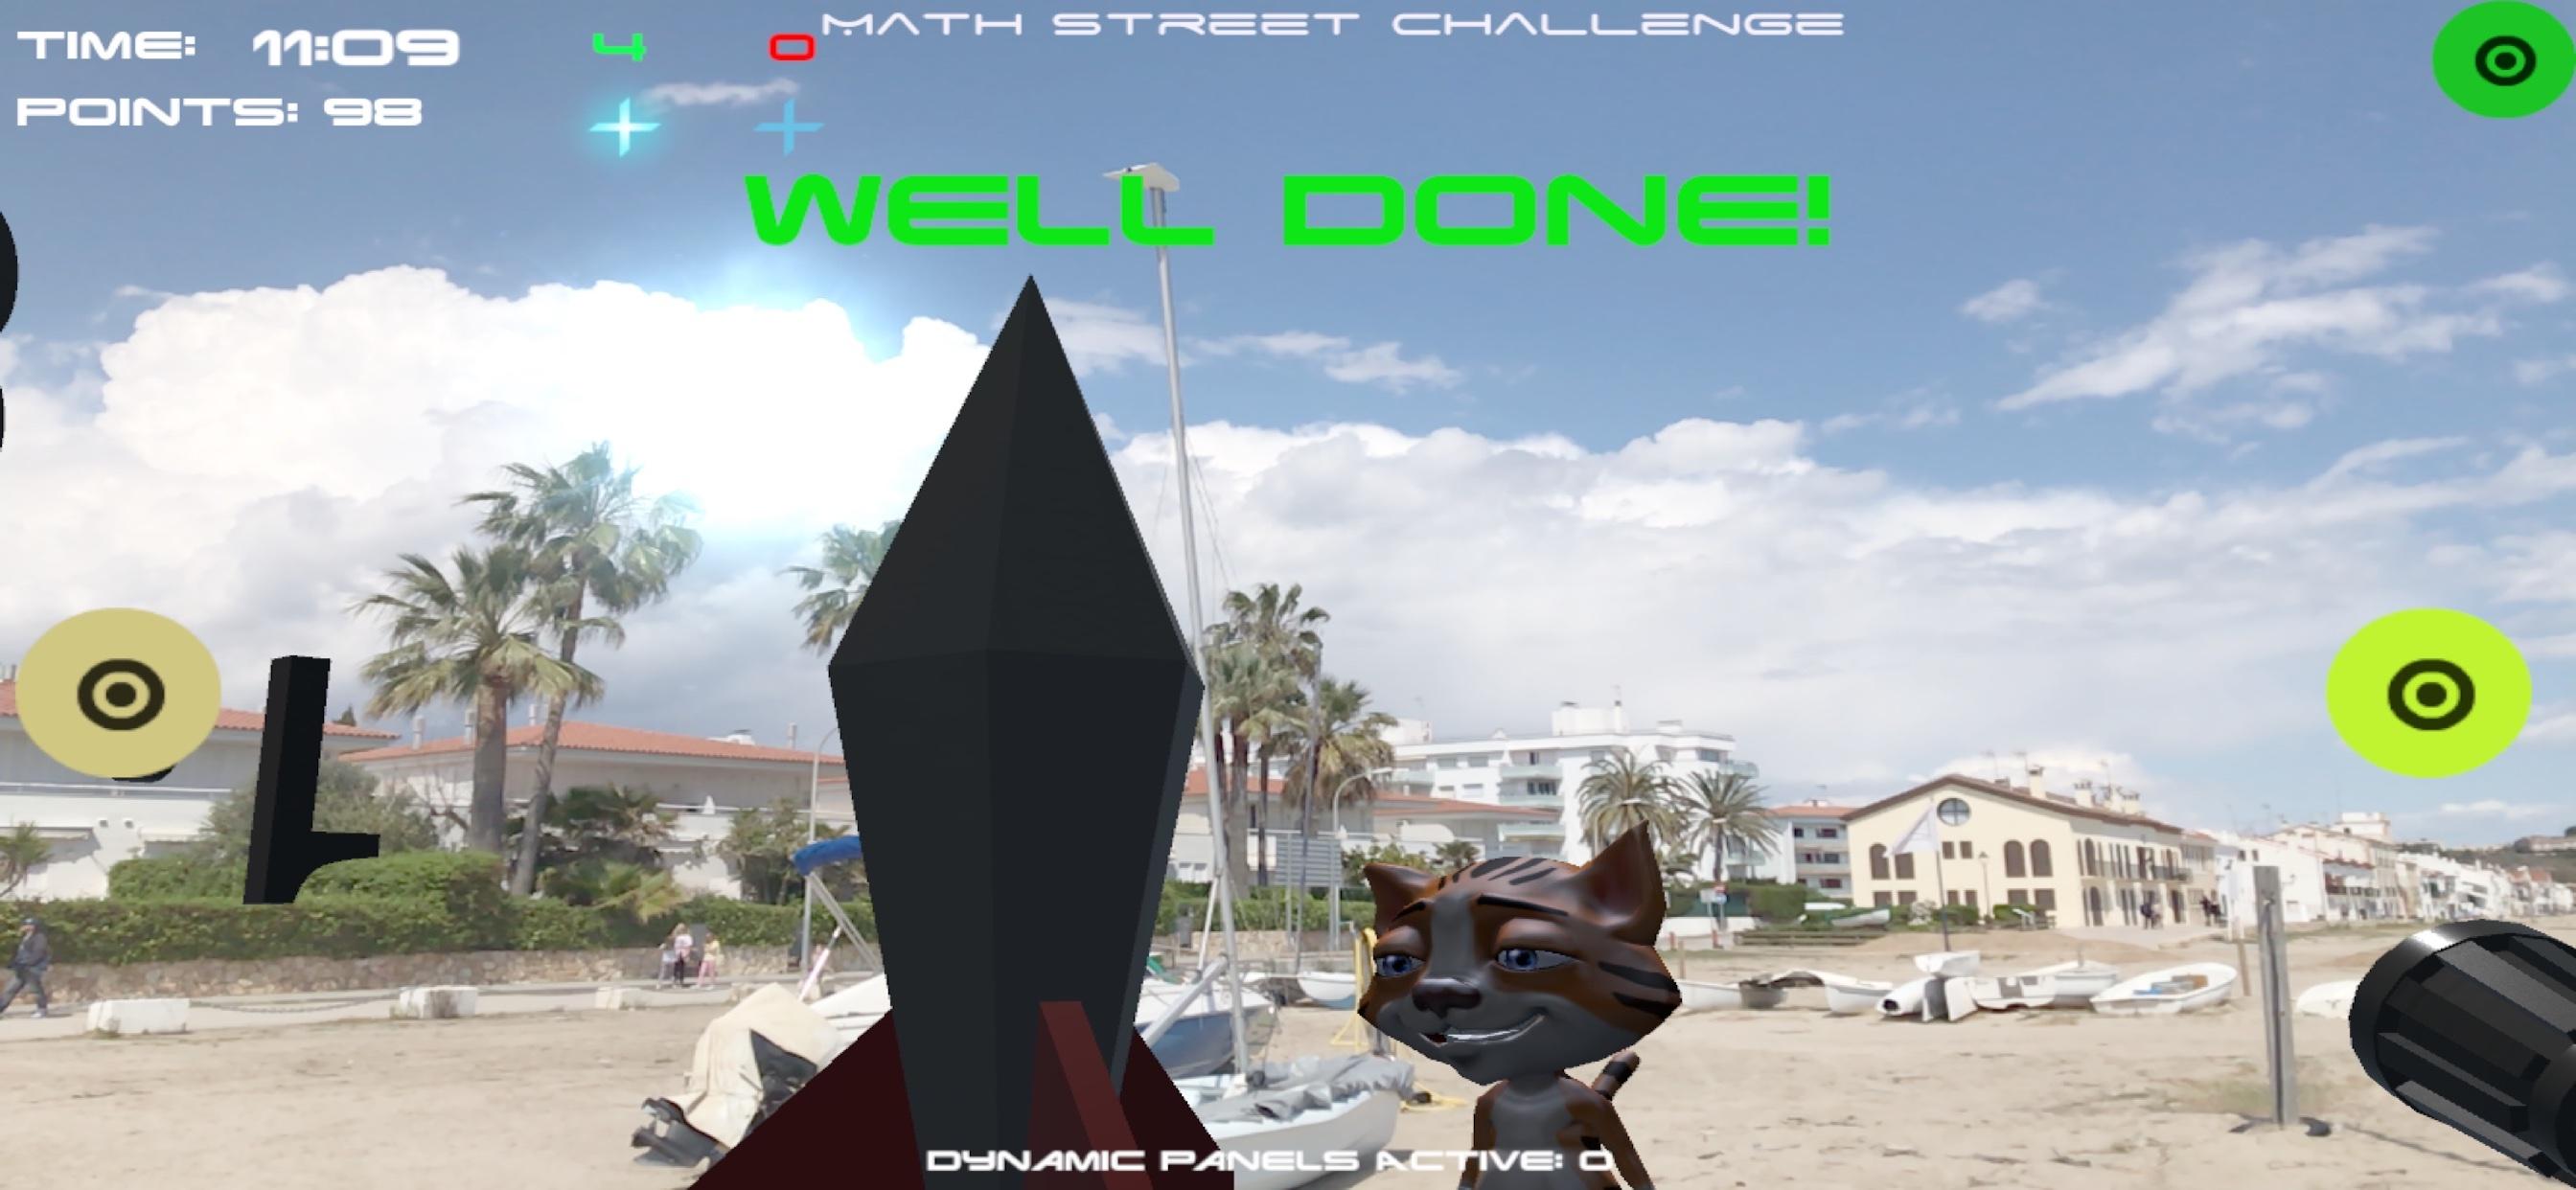 Math Street Challenge